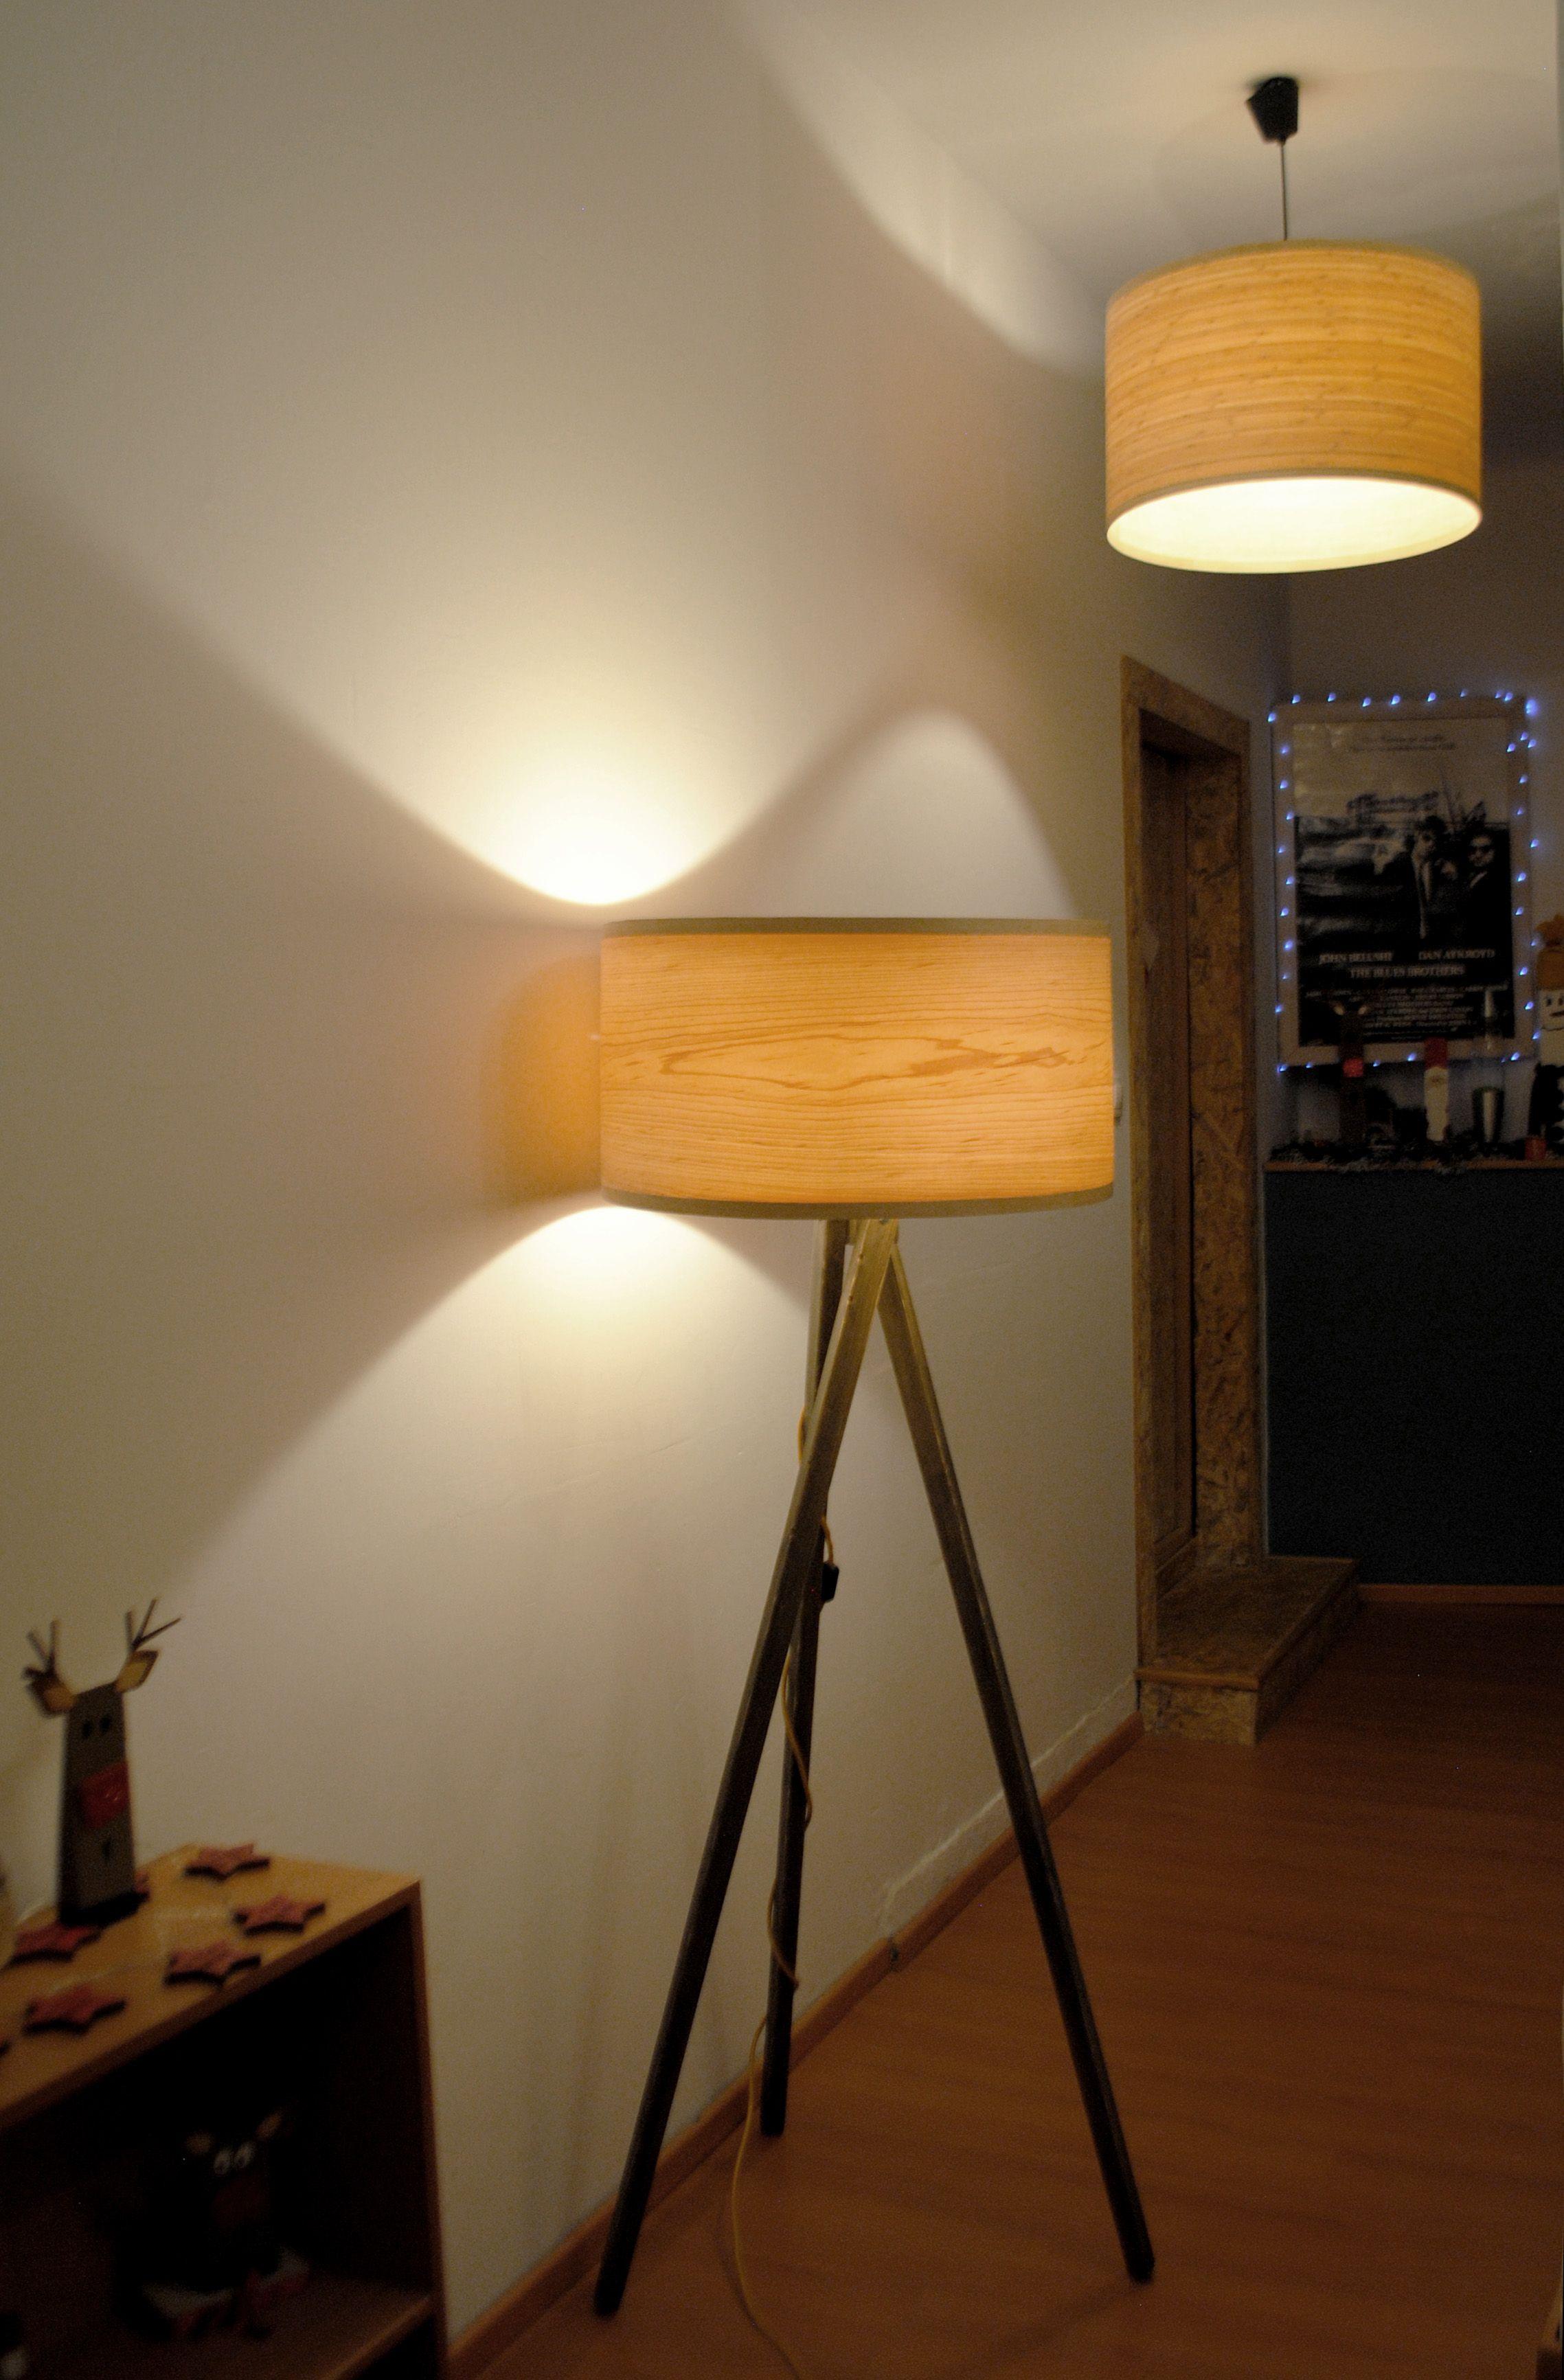 Wood Wooden Woodworking Woodart Woodwork Woodlamp Woodlight Woodies Woodenlamp